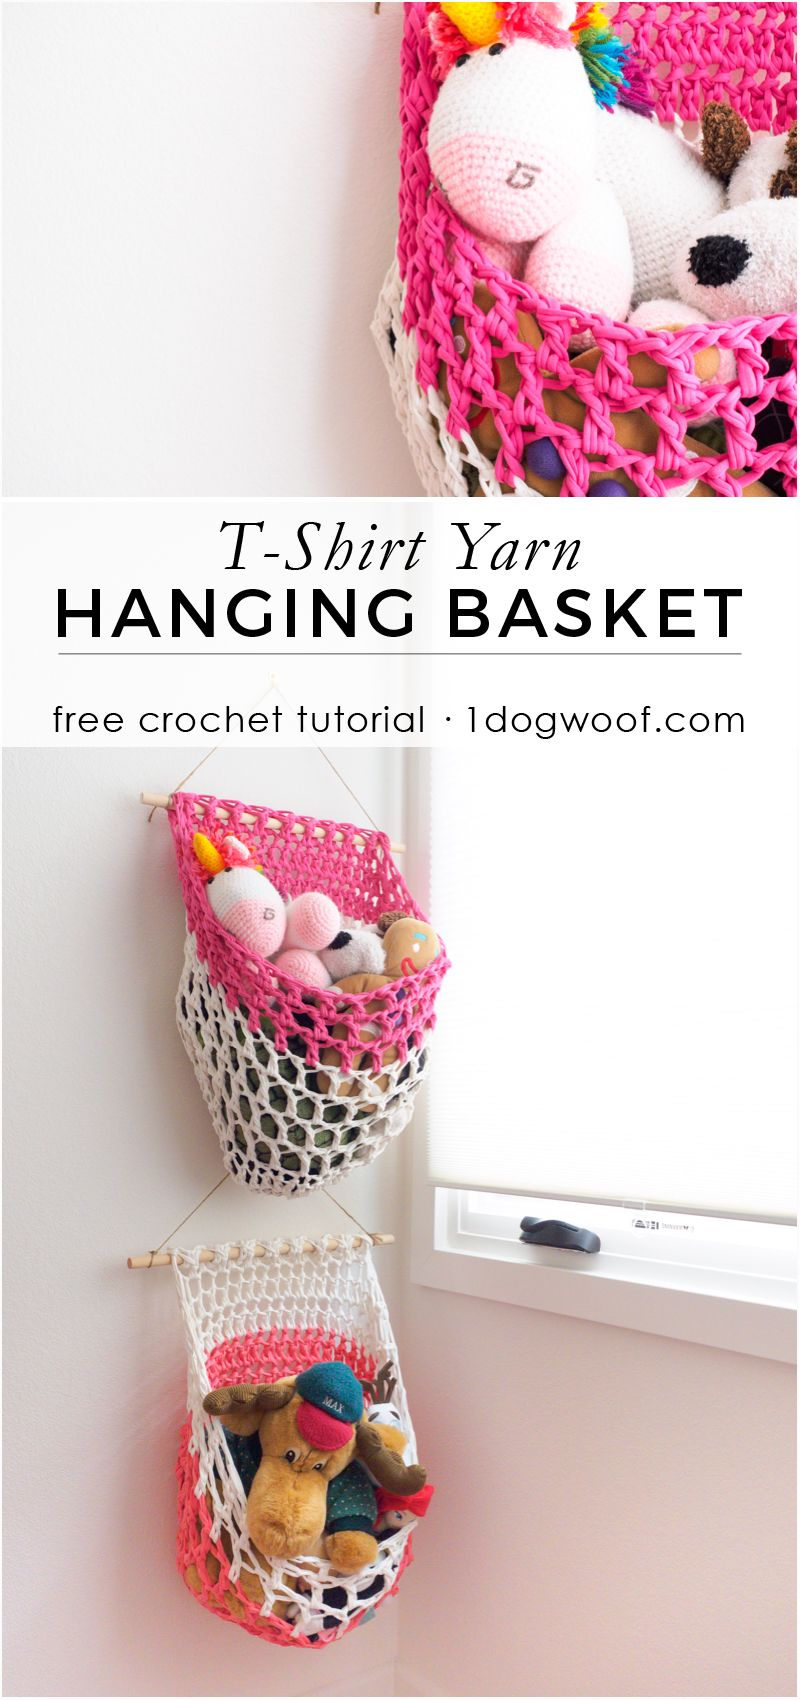 T-Shirt Yarn Hanging Basket Crochet Pattern | Trapillo, Cesto y Cestas